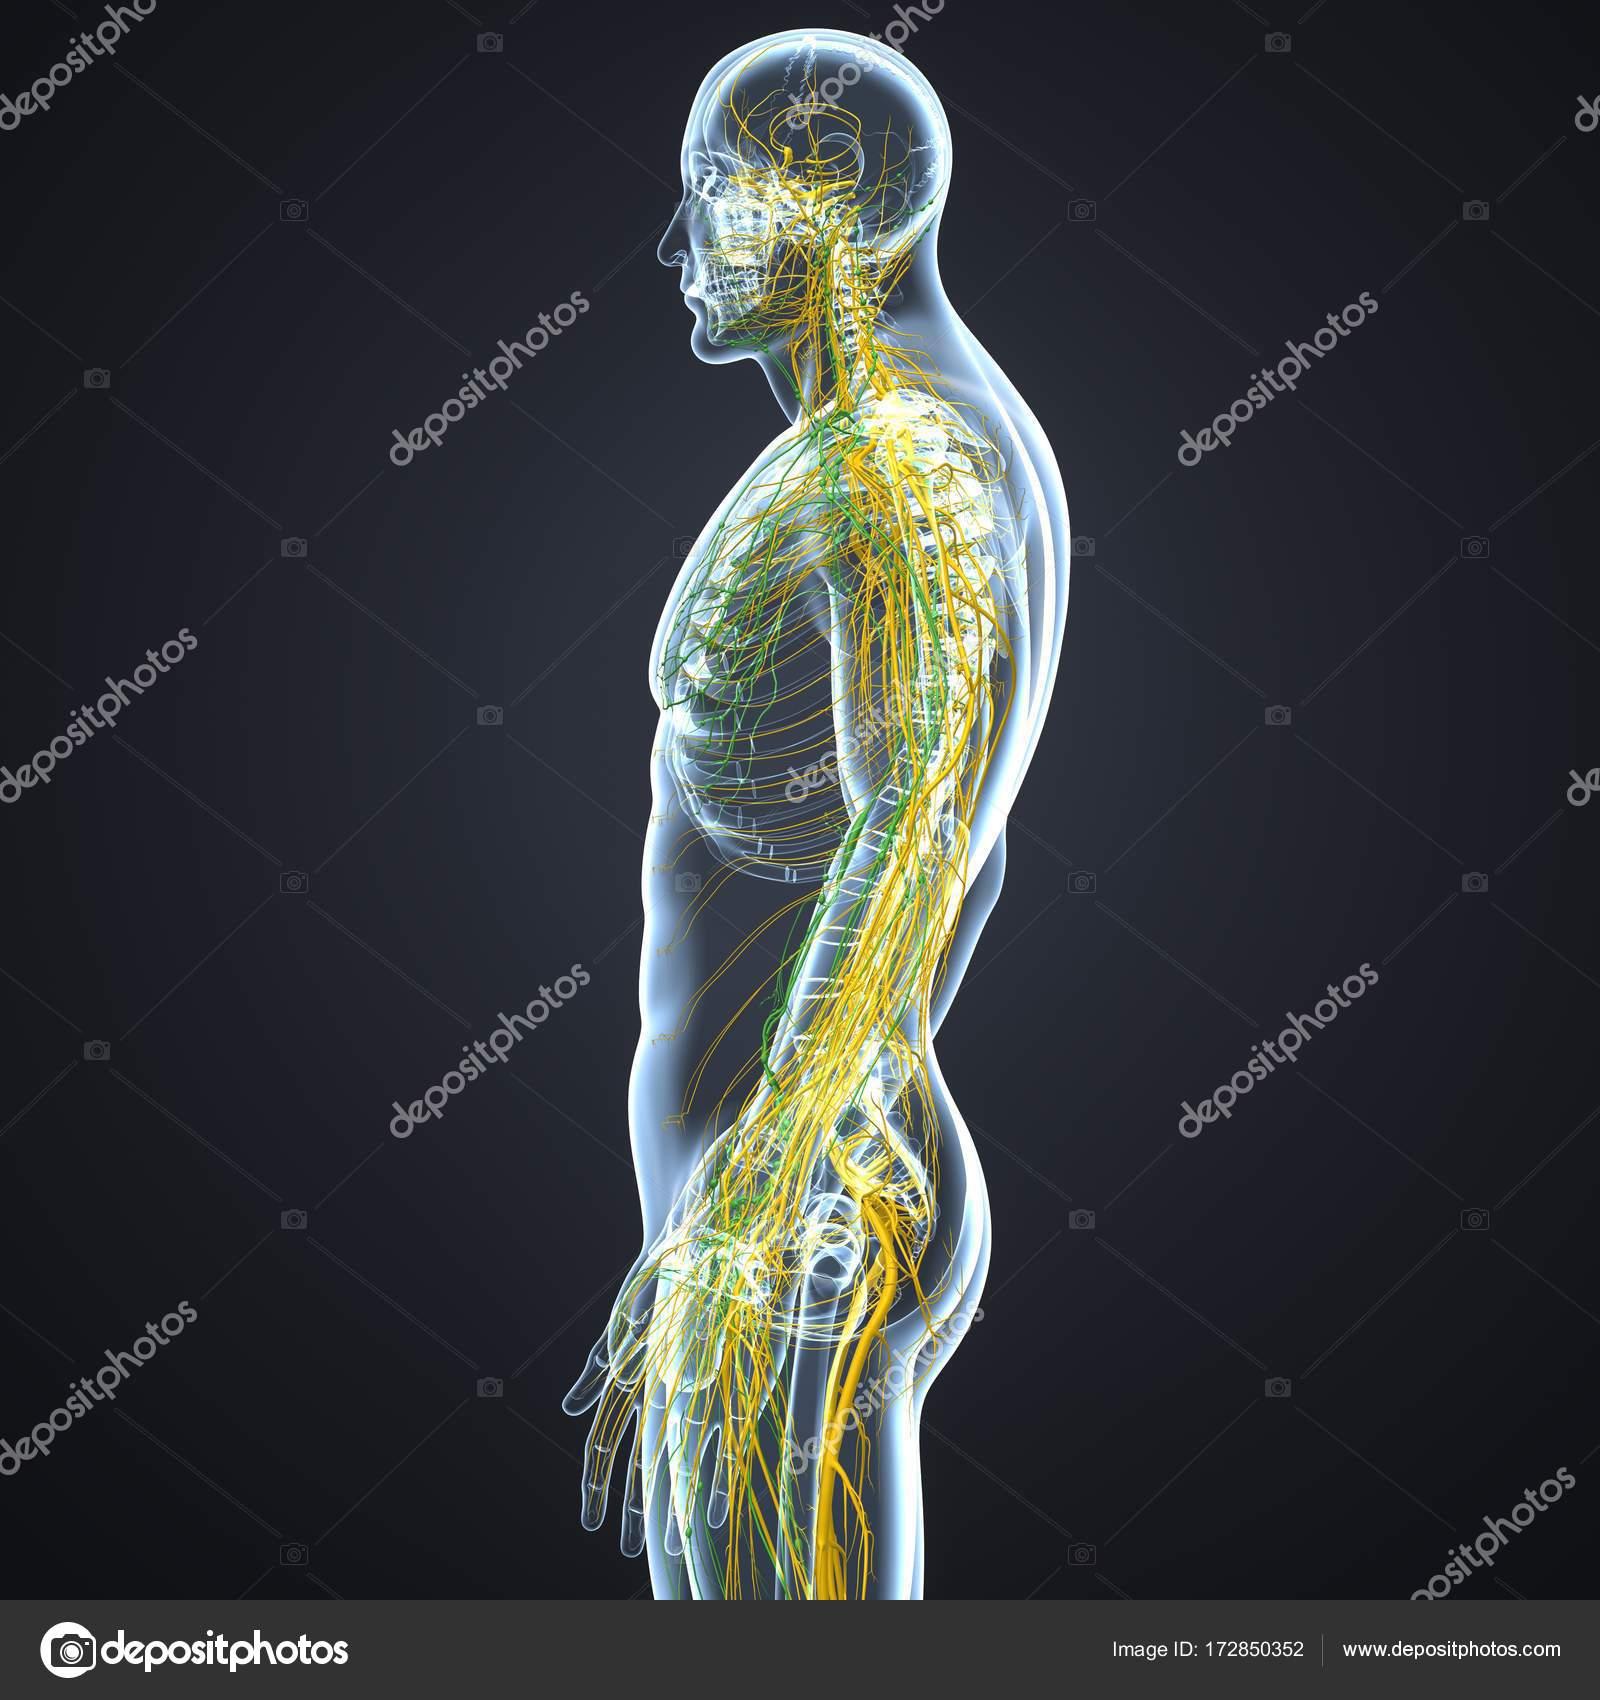 Nerven und Lymphknoten — Stockfoto © sciencepics #172850352